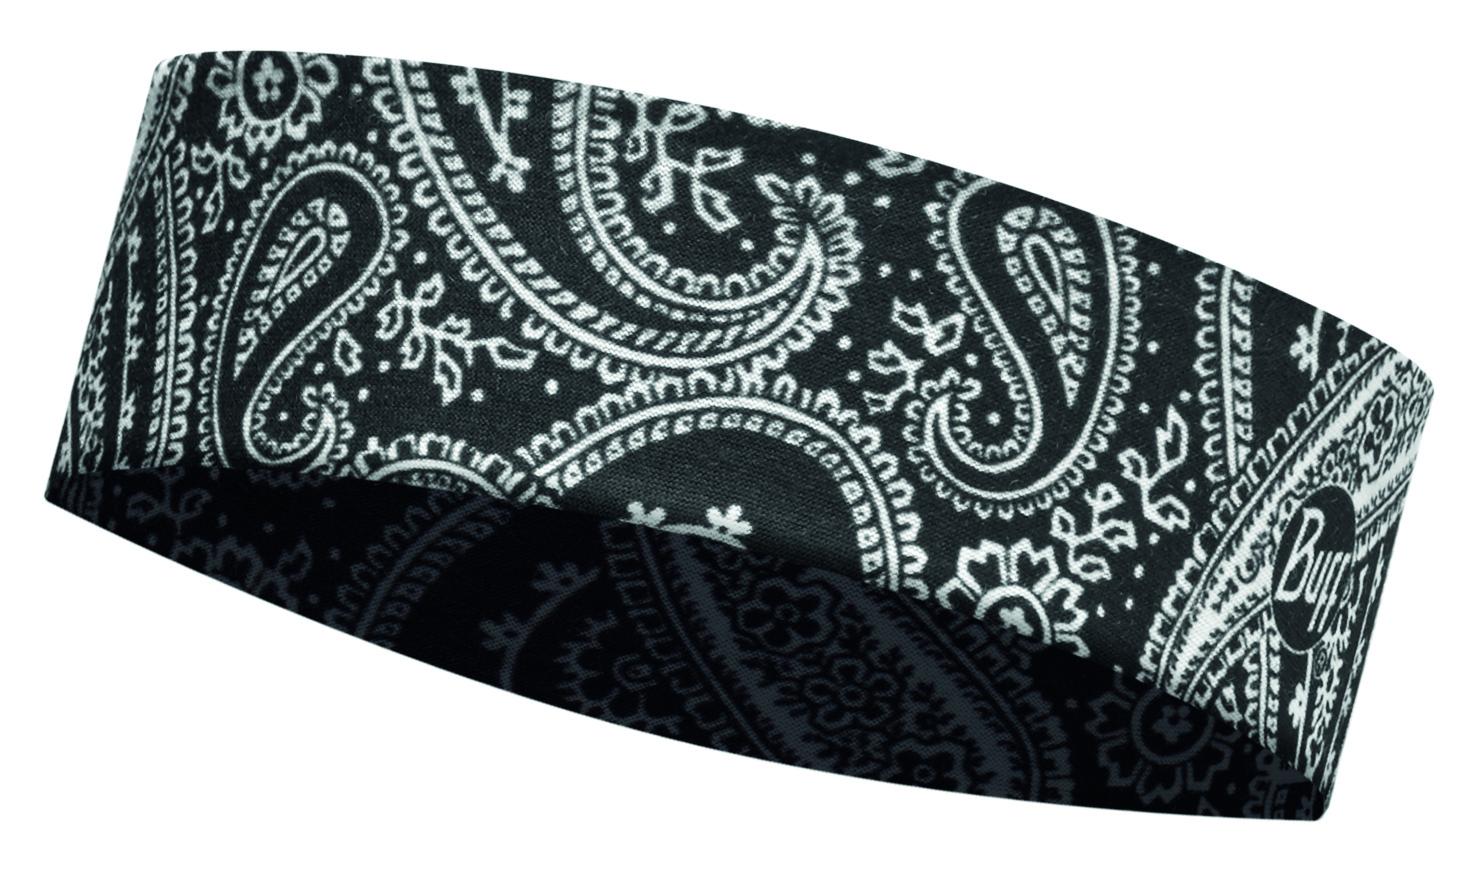 Купить Повязка BUFF Headband CAIL BLACK Банданы и шарфы Buff ® 1312850